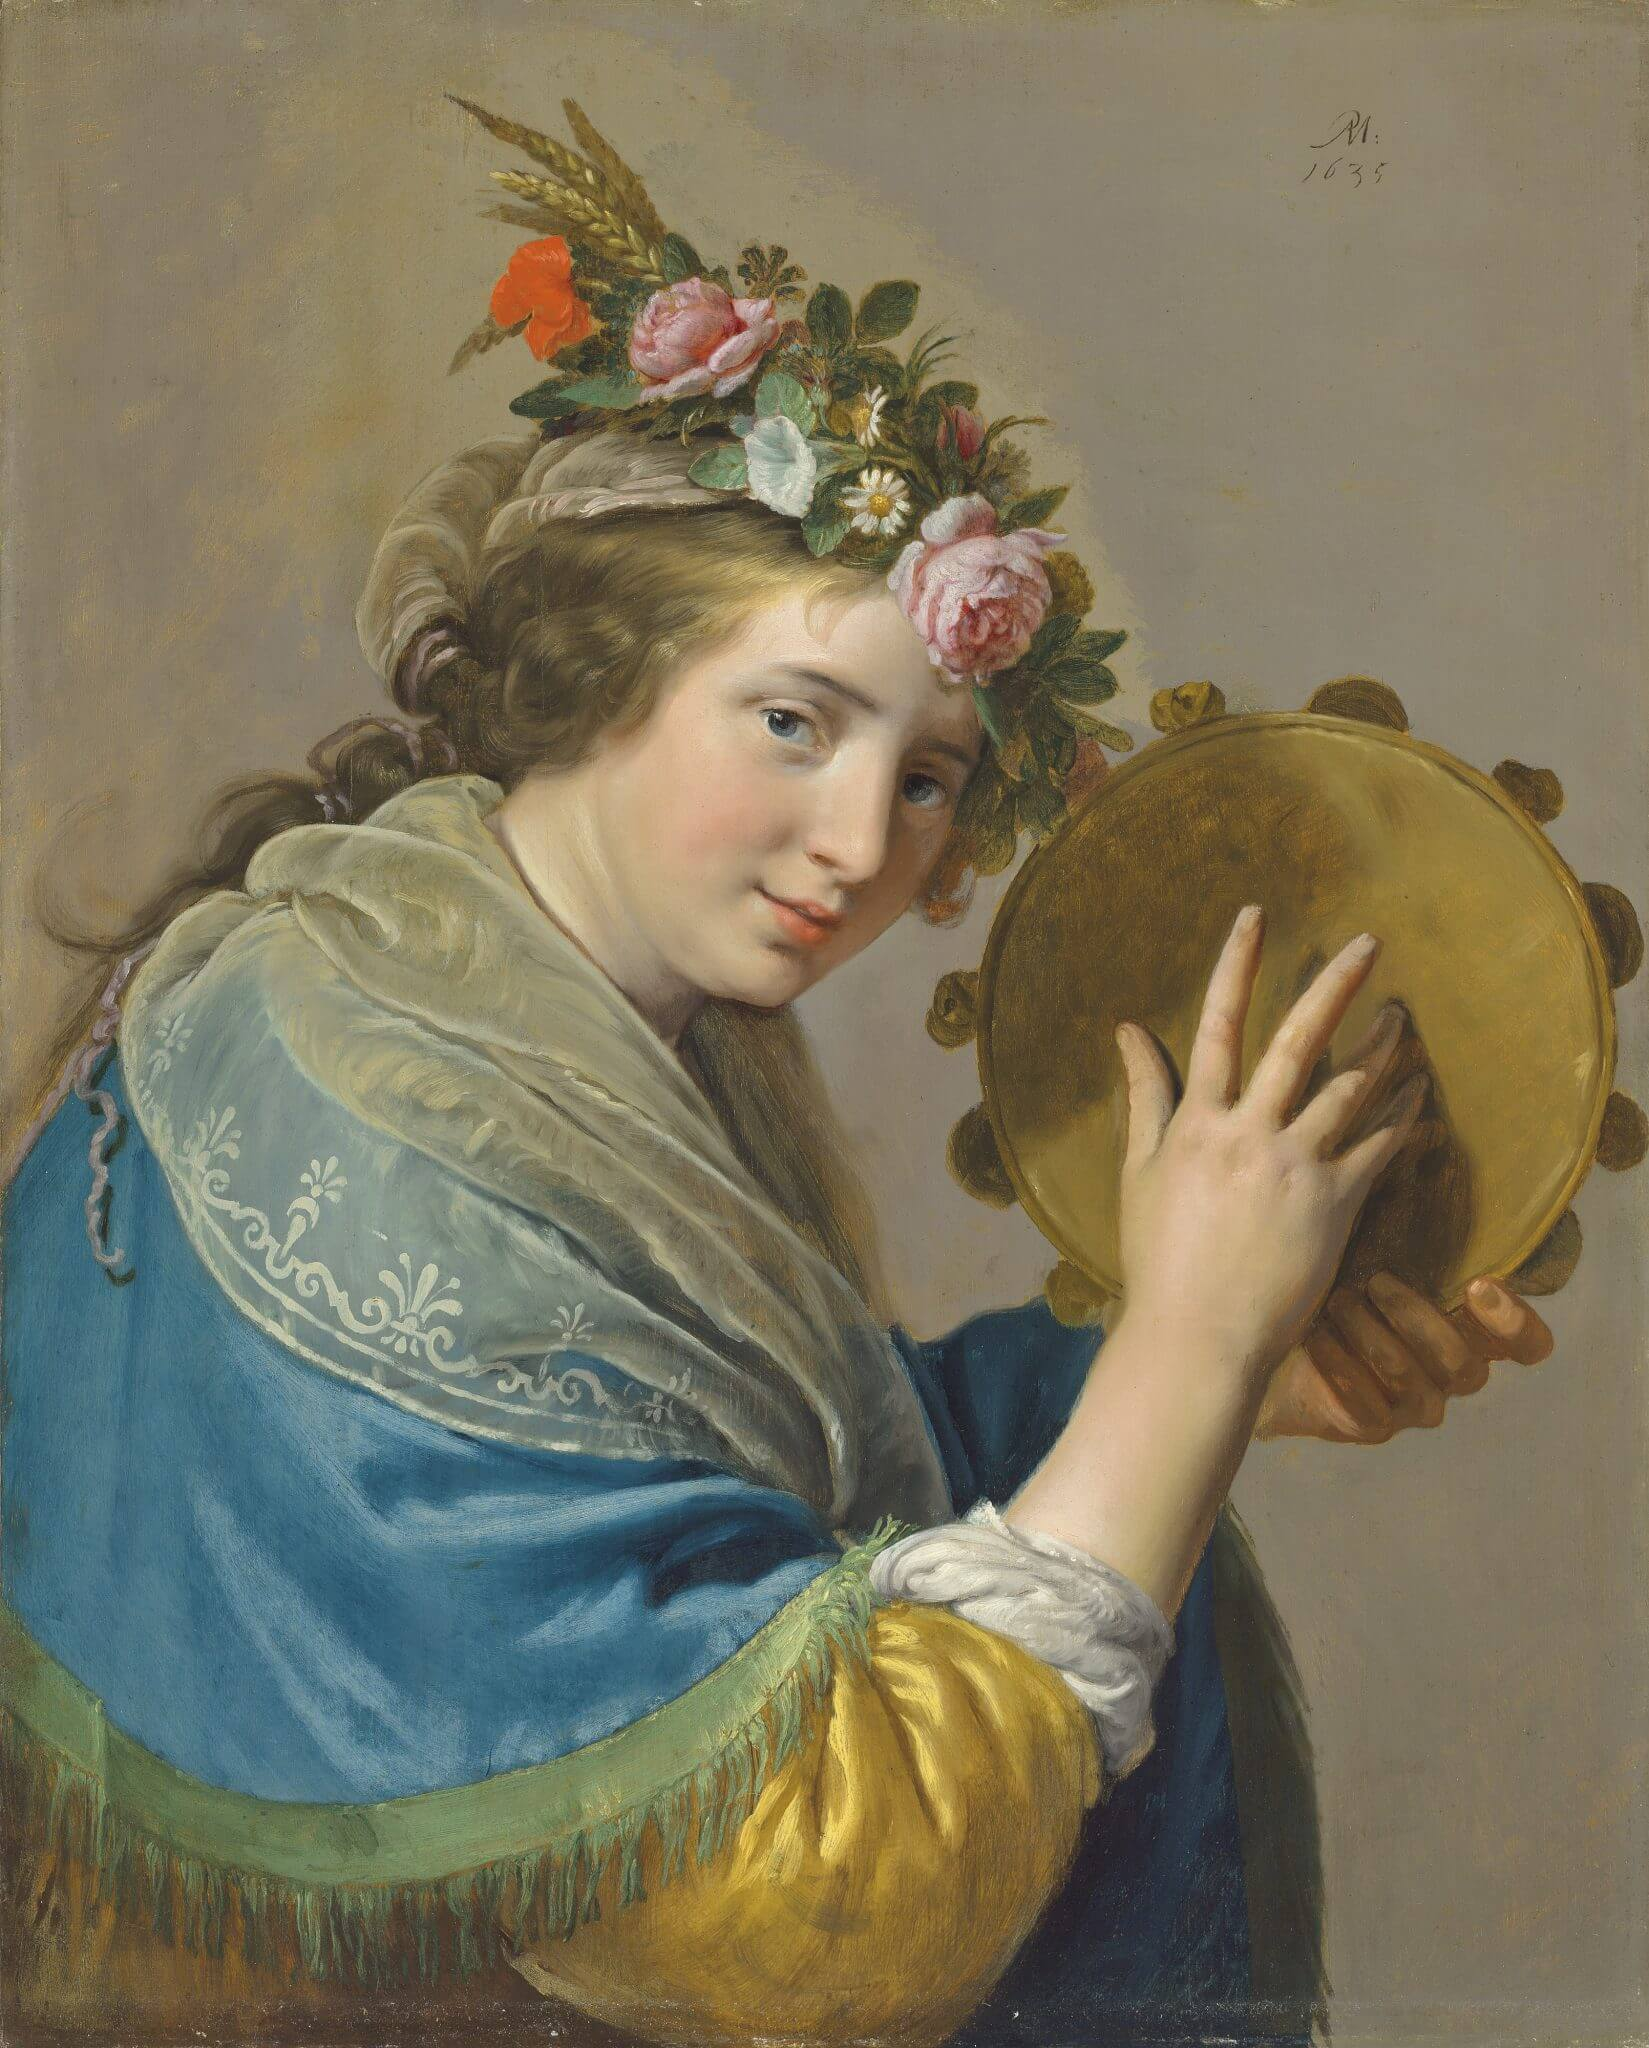 Shepherdess with a Tambourine